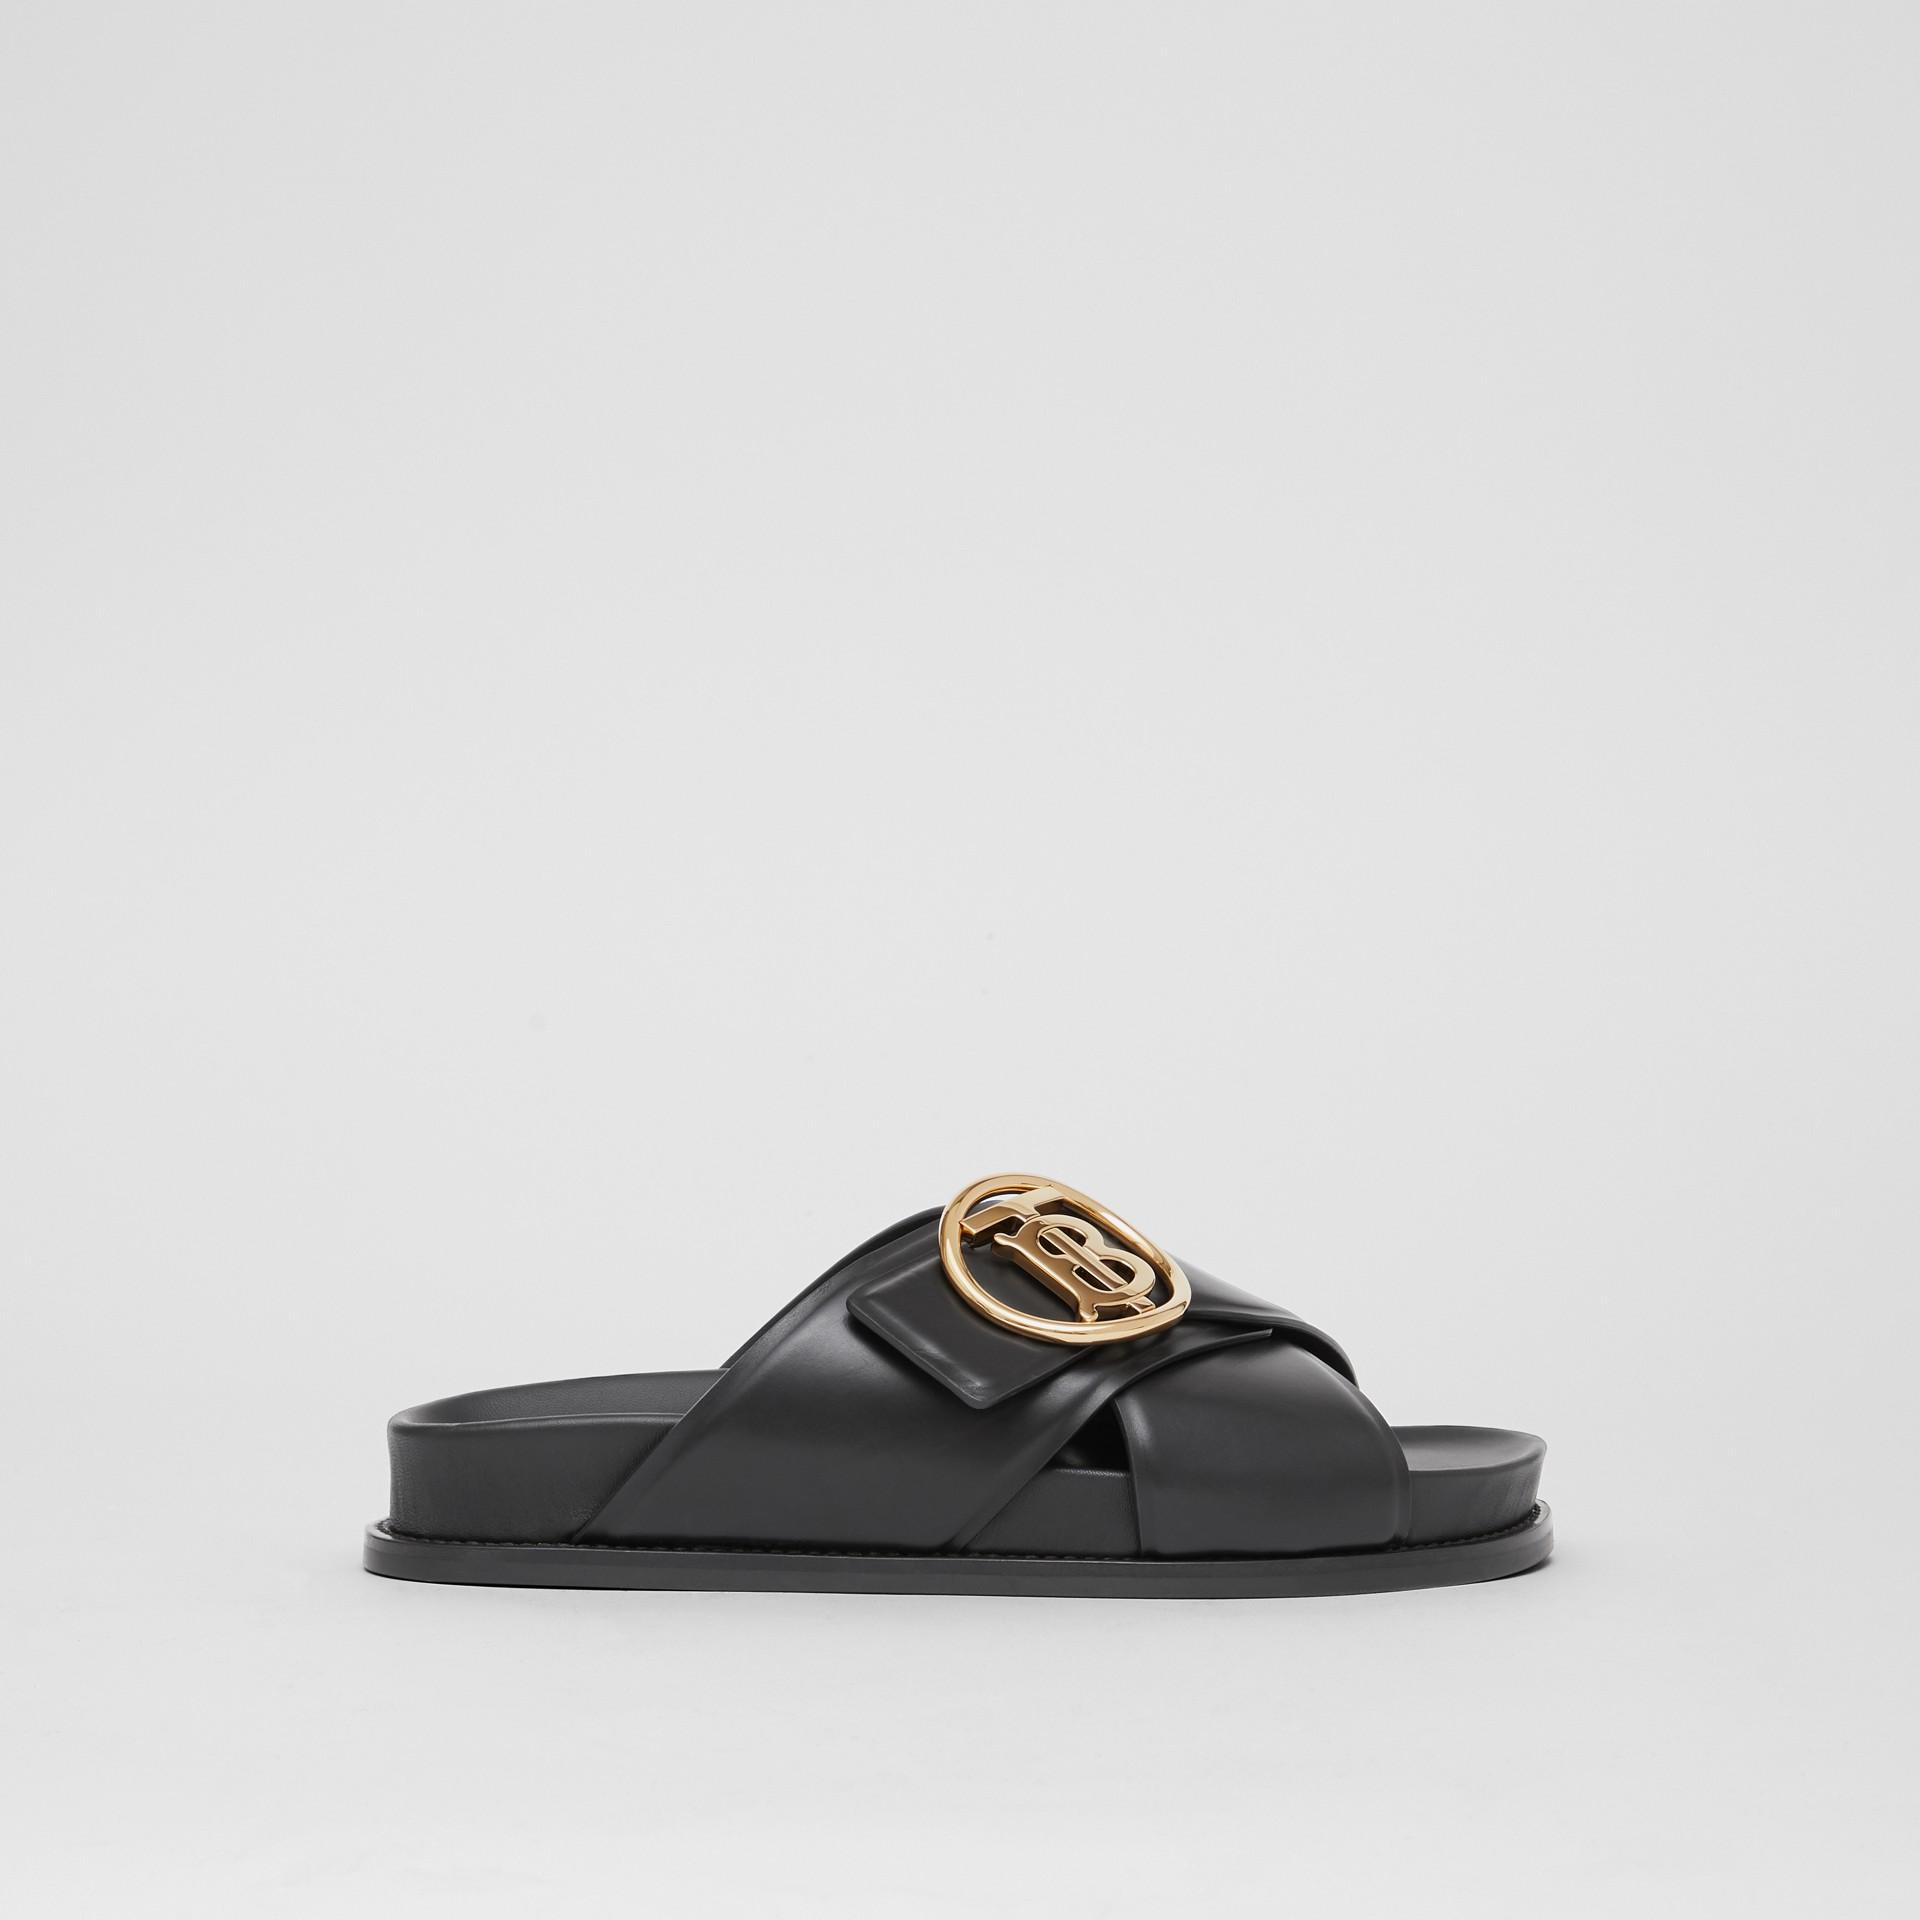 Monogram Motif Leather Slides in Black - Women | Burberry - gallery image 5